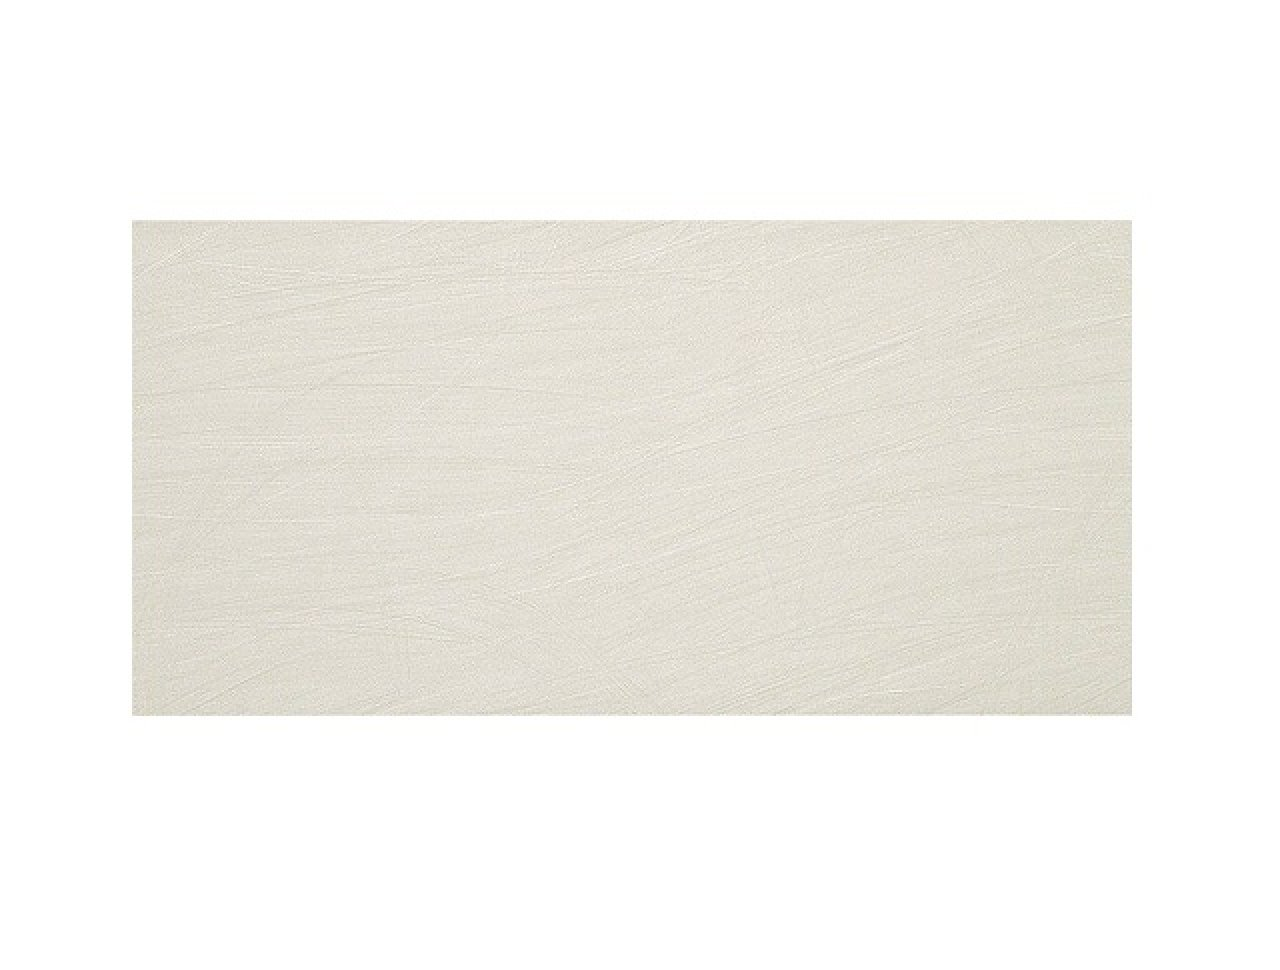 Настенная плитка Magnifique Avorio Satin 40x80